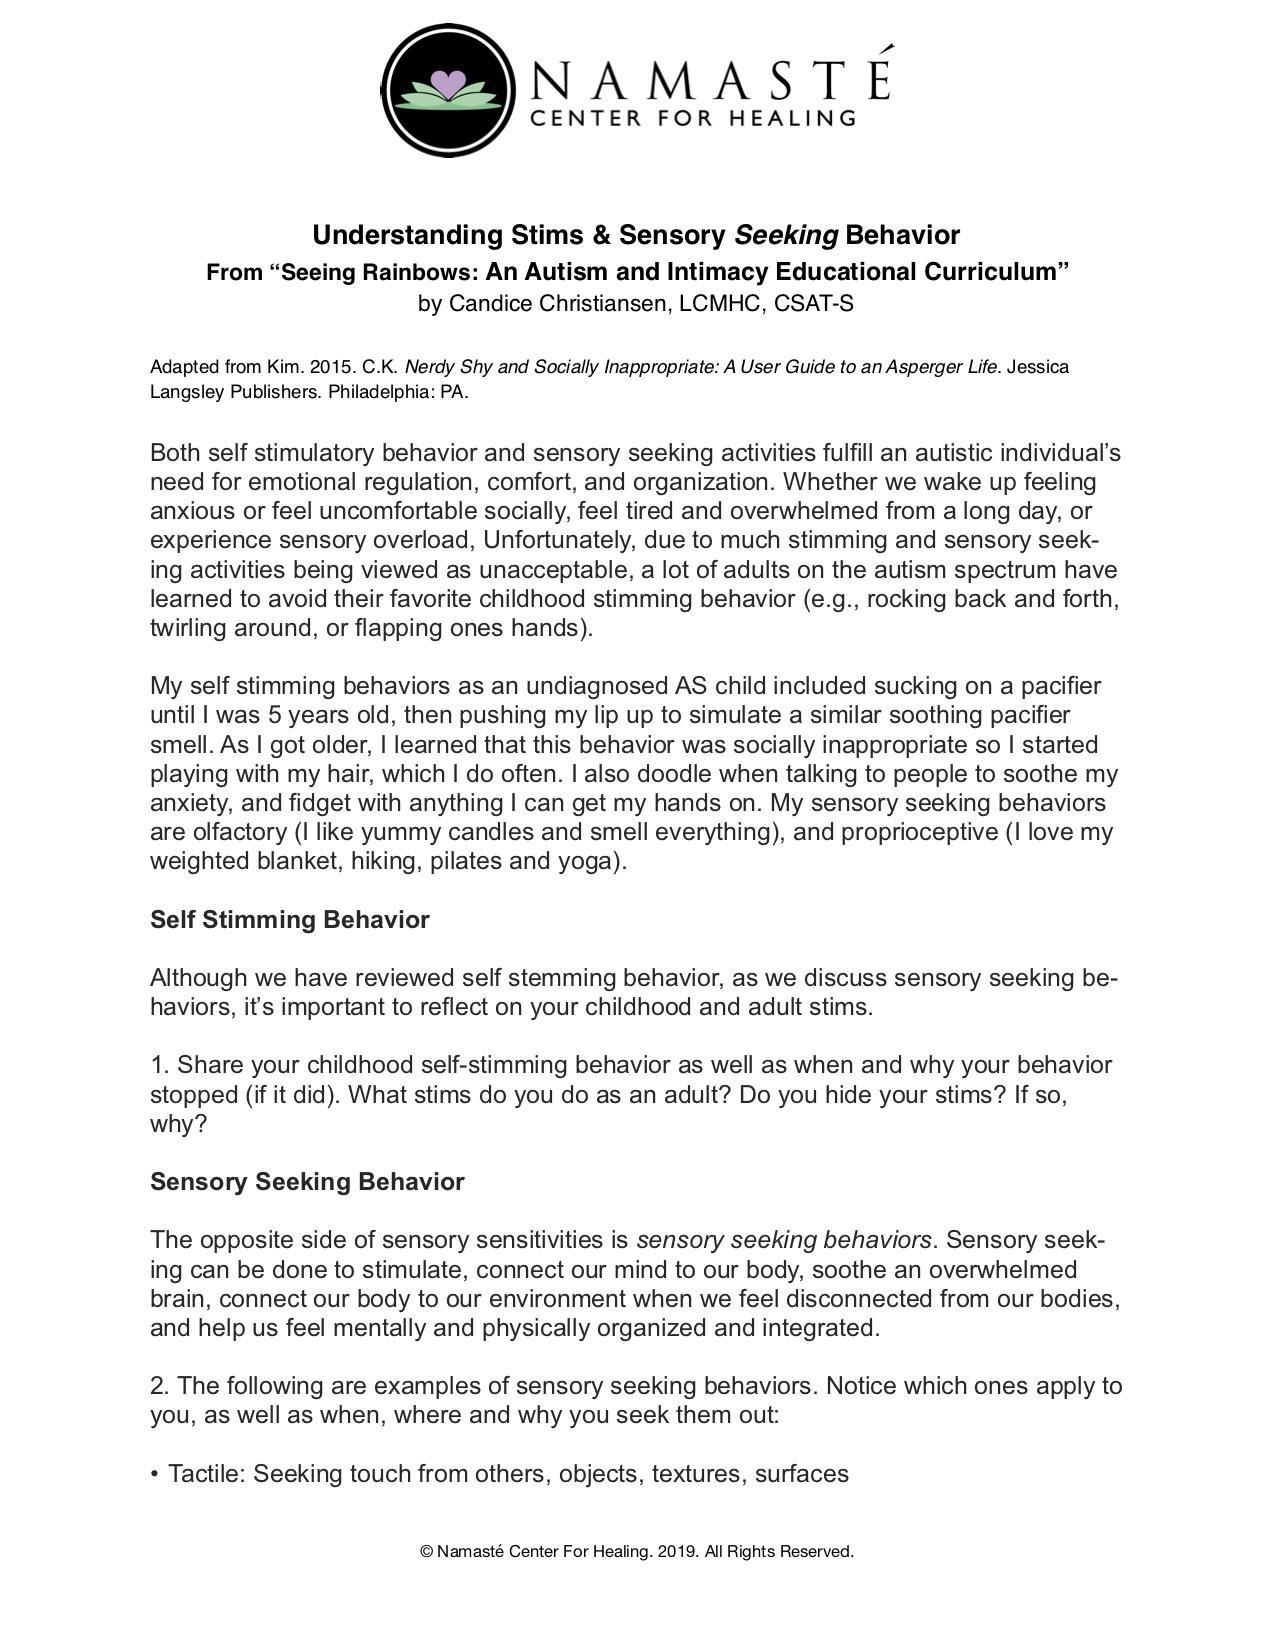 Understanding Stims & Sensory Seeking Behavior - by Candice Christiansen, LCMHC, CSAT-S